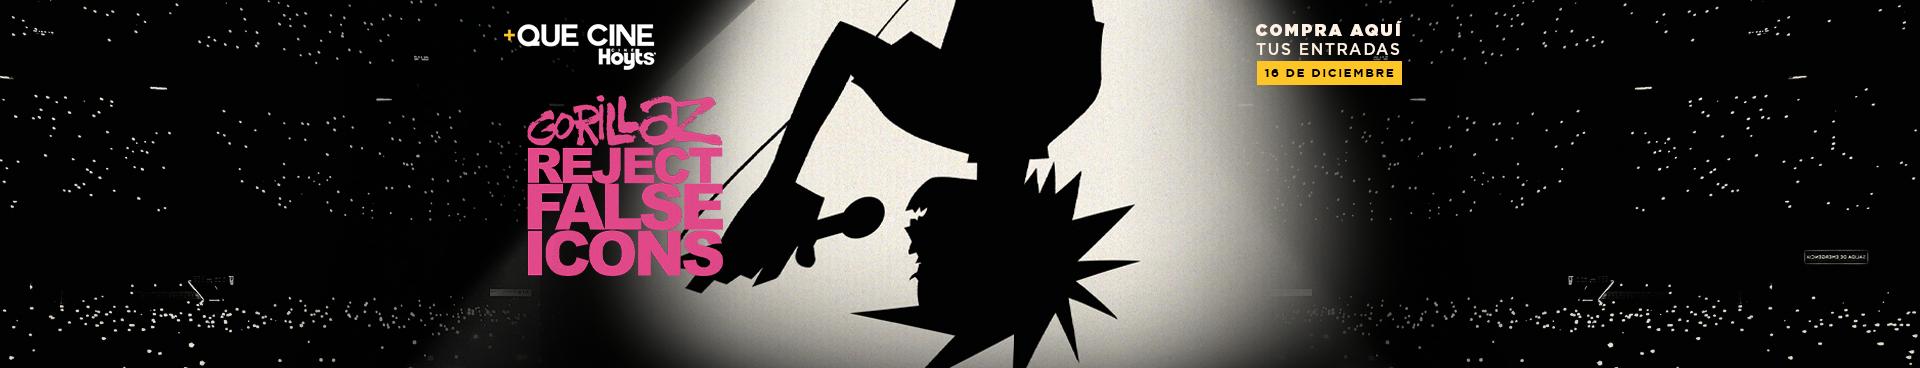 +QUE CINE: GORILLAZ: REJECT FALSE ICONS 16 DE DICIEMBRE, COMPRA AQUÍ TUS ENTRADAS